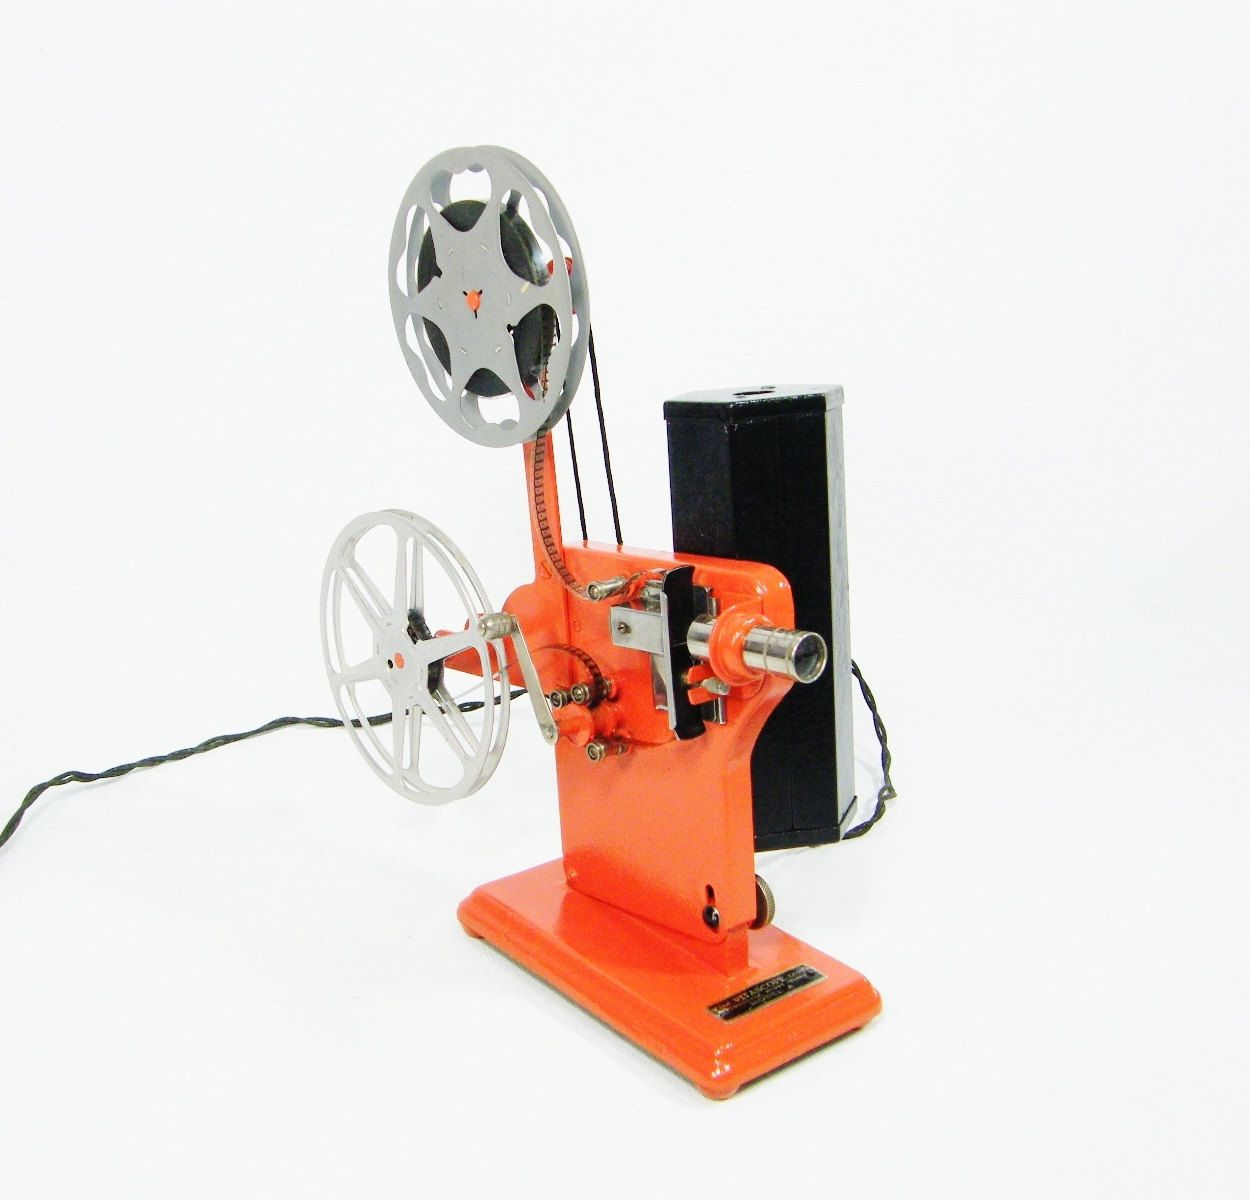 hand crank Film Projector 1930's Vitascope  um, yeah  I